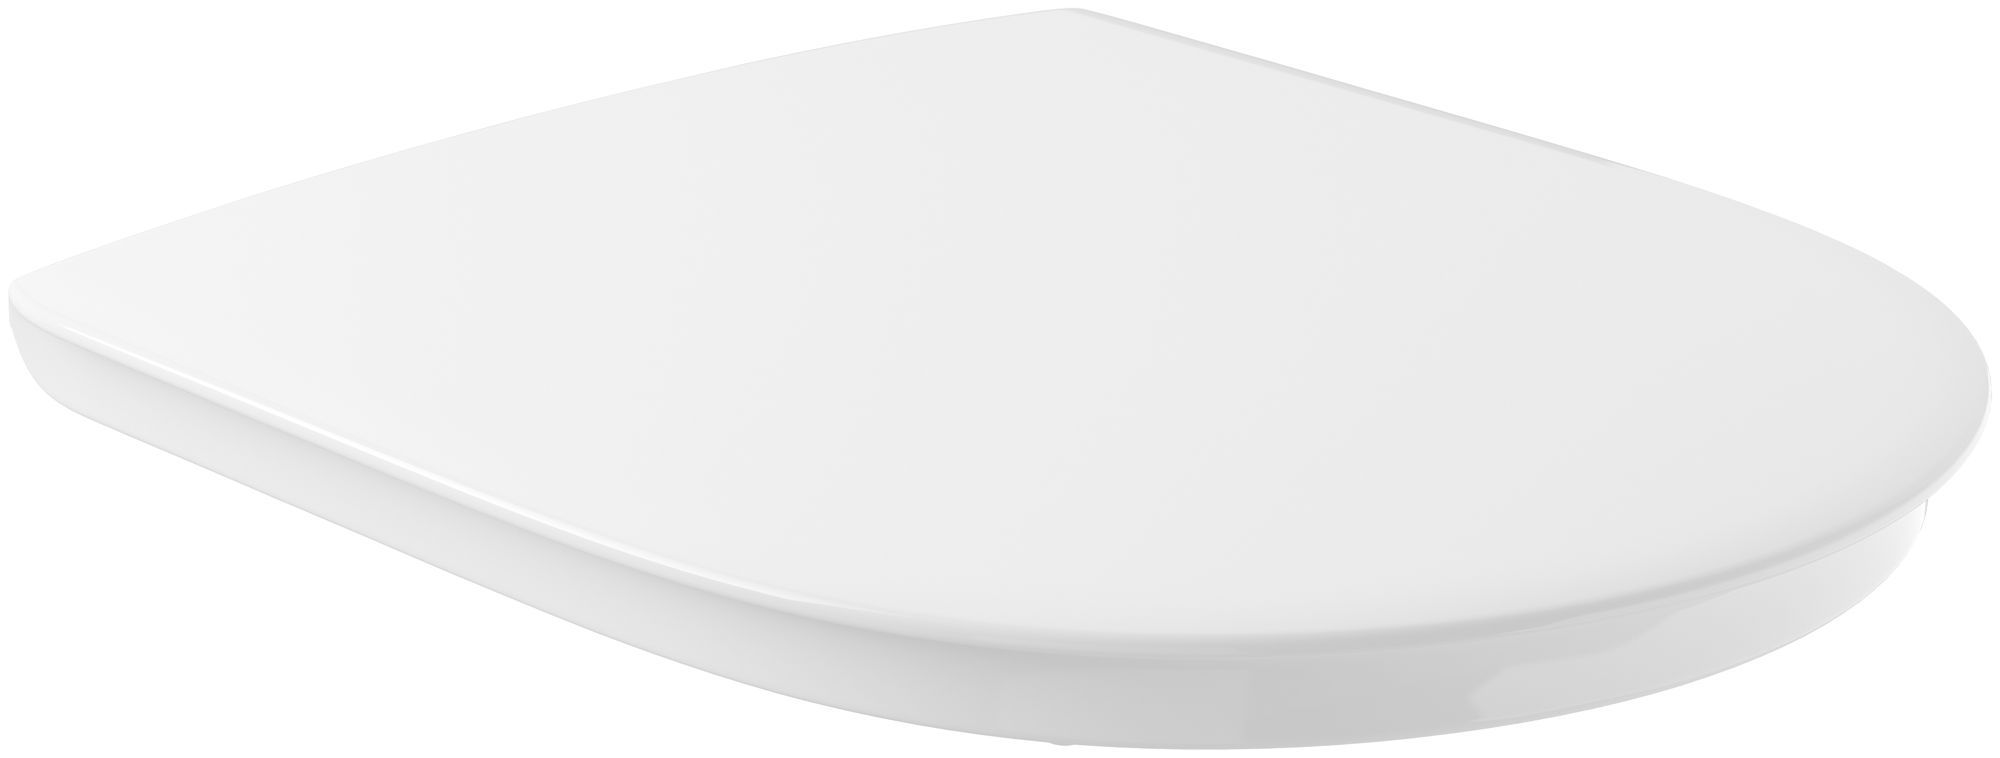 Villeroy & Boch O.Novo Vita WC-Sitz weiß mit AntiBac 9M7261T1